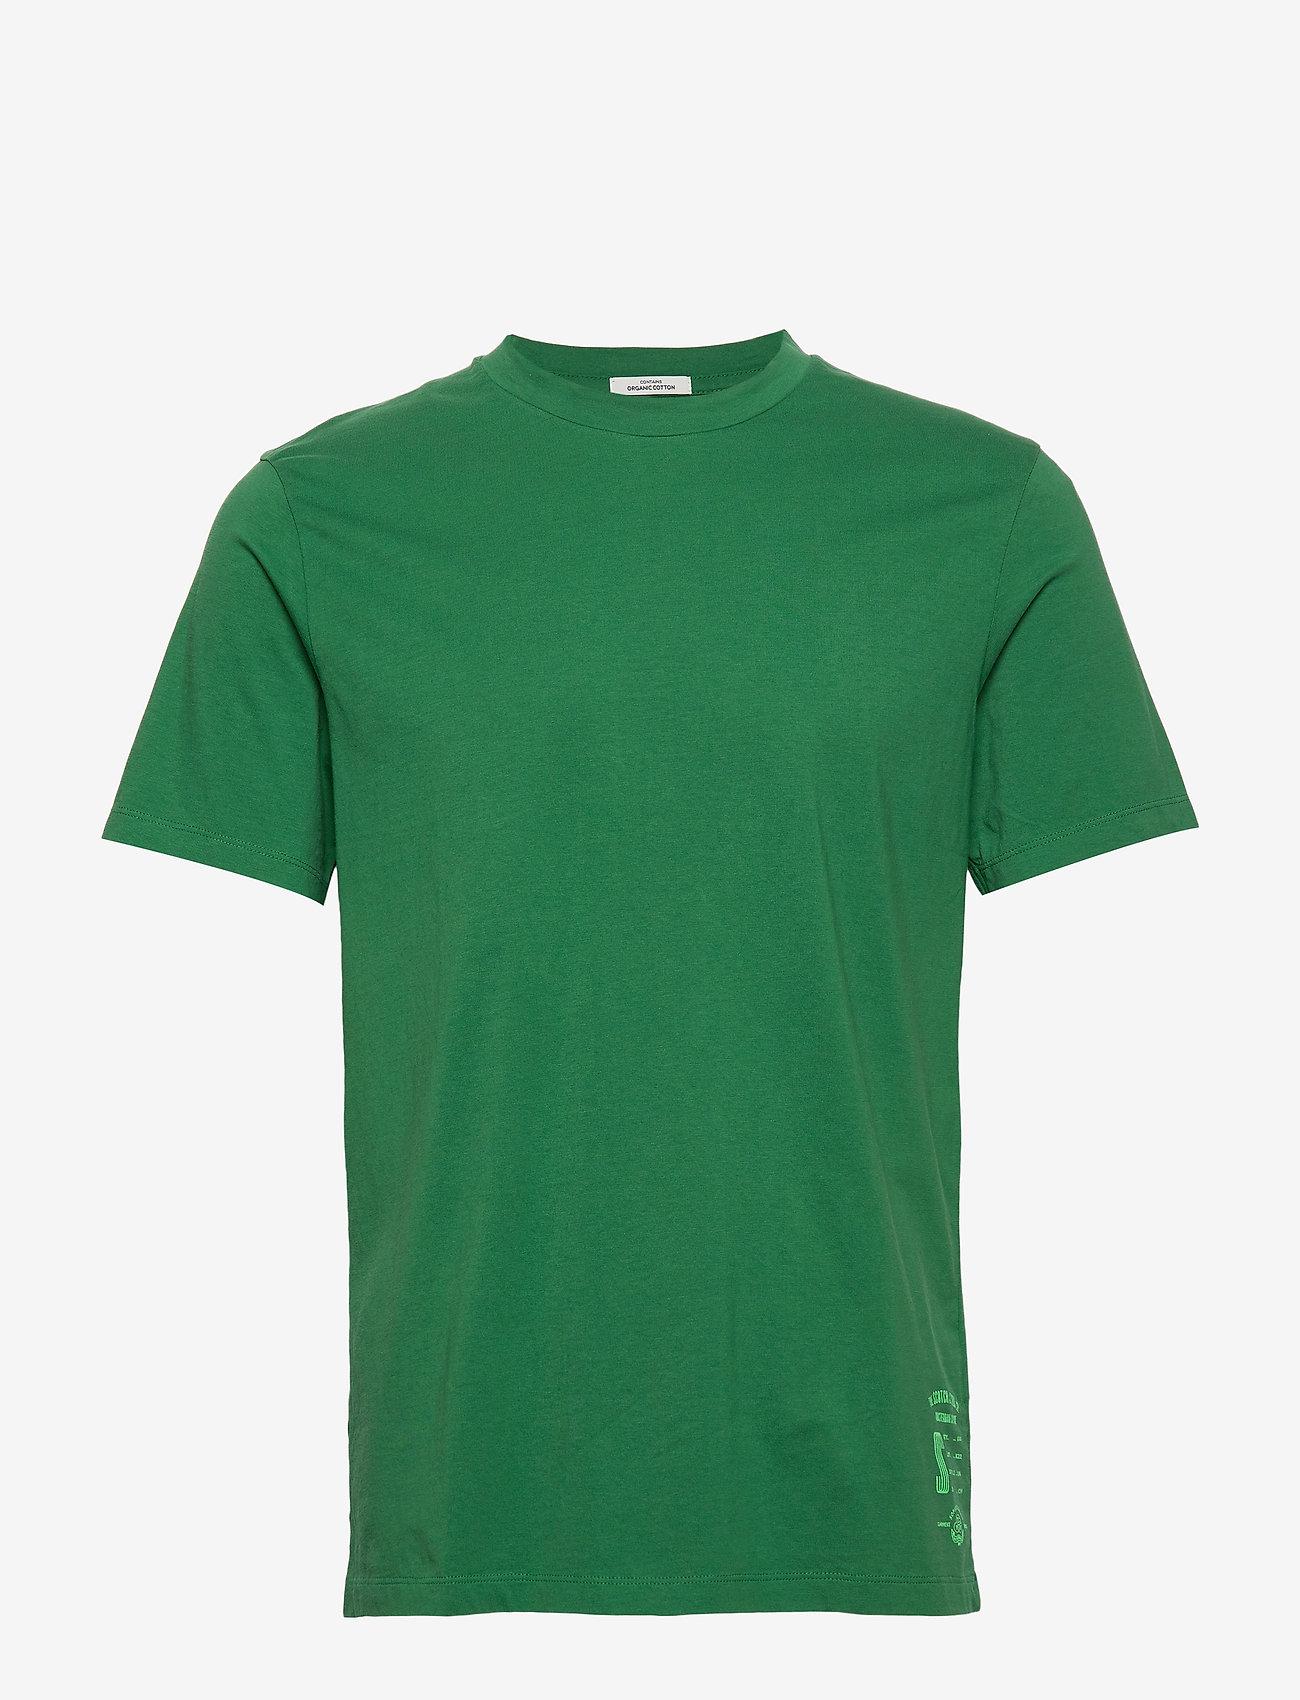 Scotch & Soda - Classic crewneck tee in organic cotton jersey - basic t-shirts - fern - 0